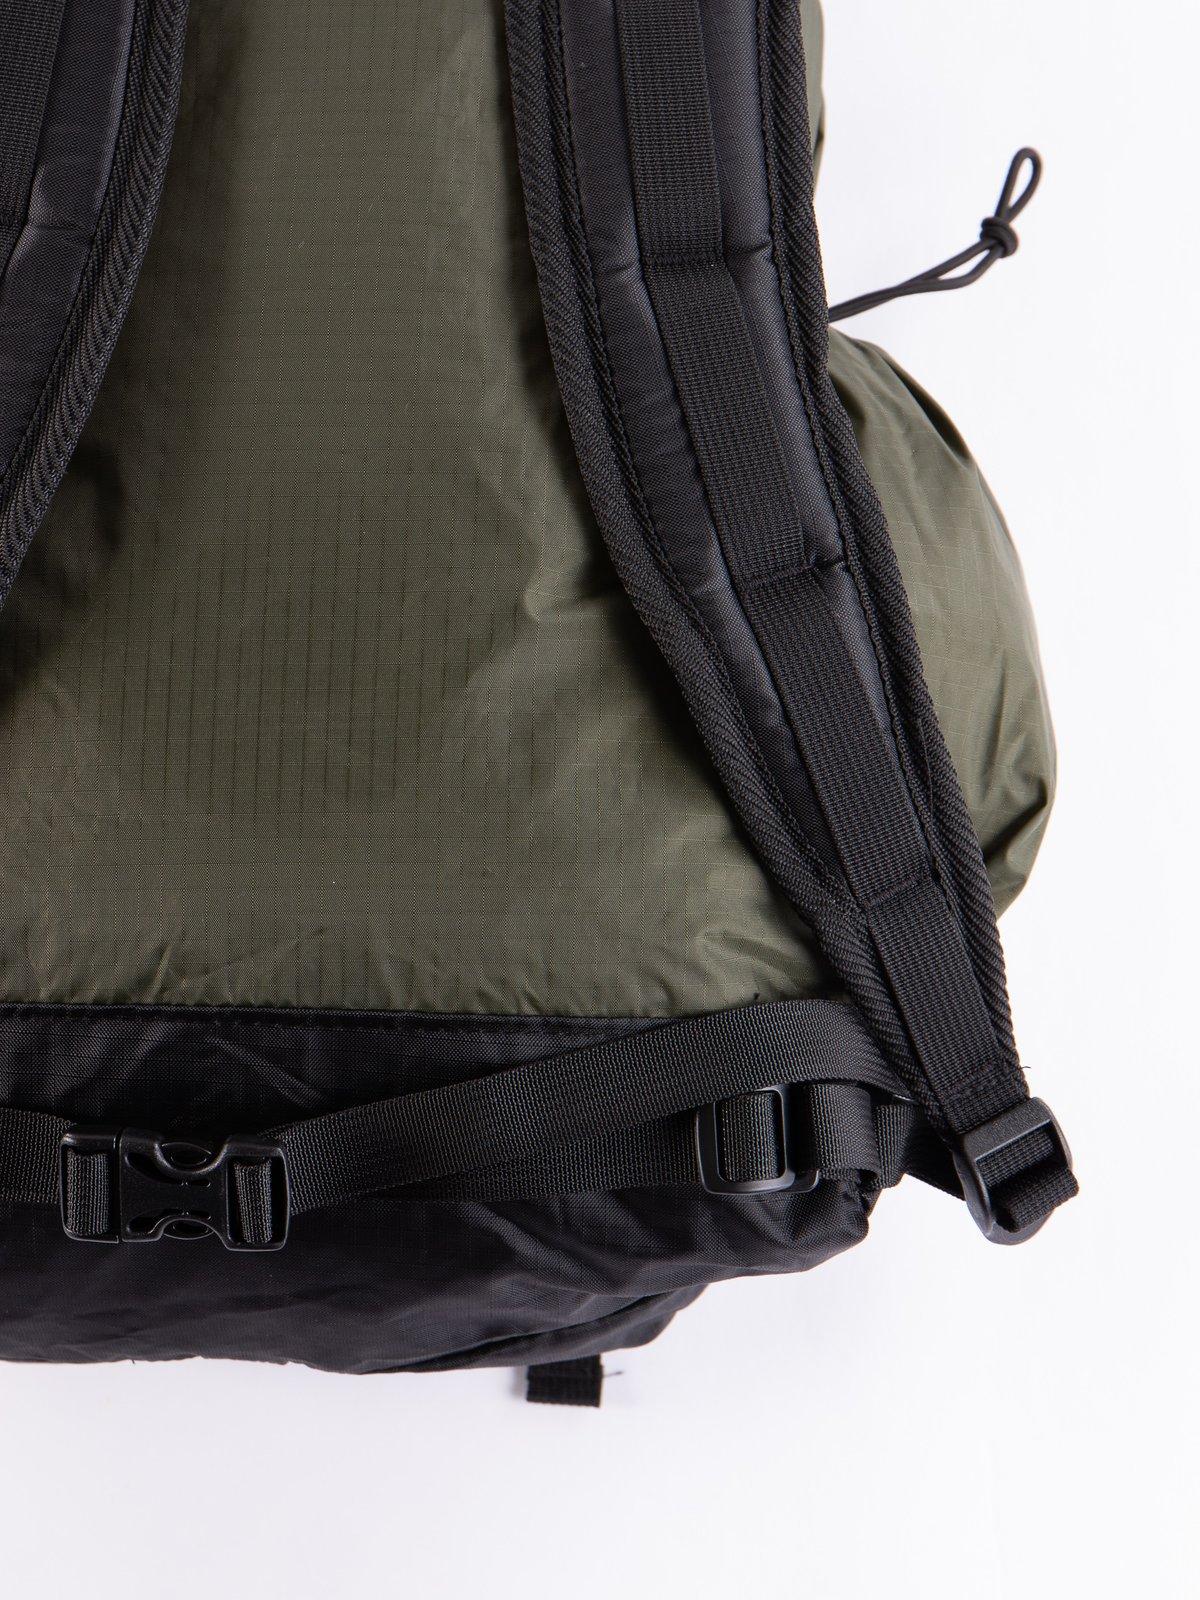 Olive Nylon Ripstop UL Backpack - Image 4